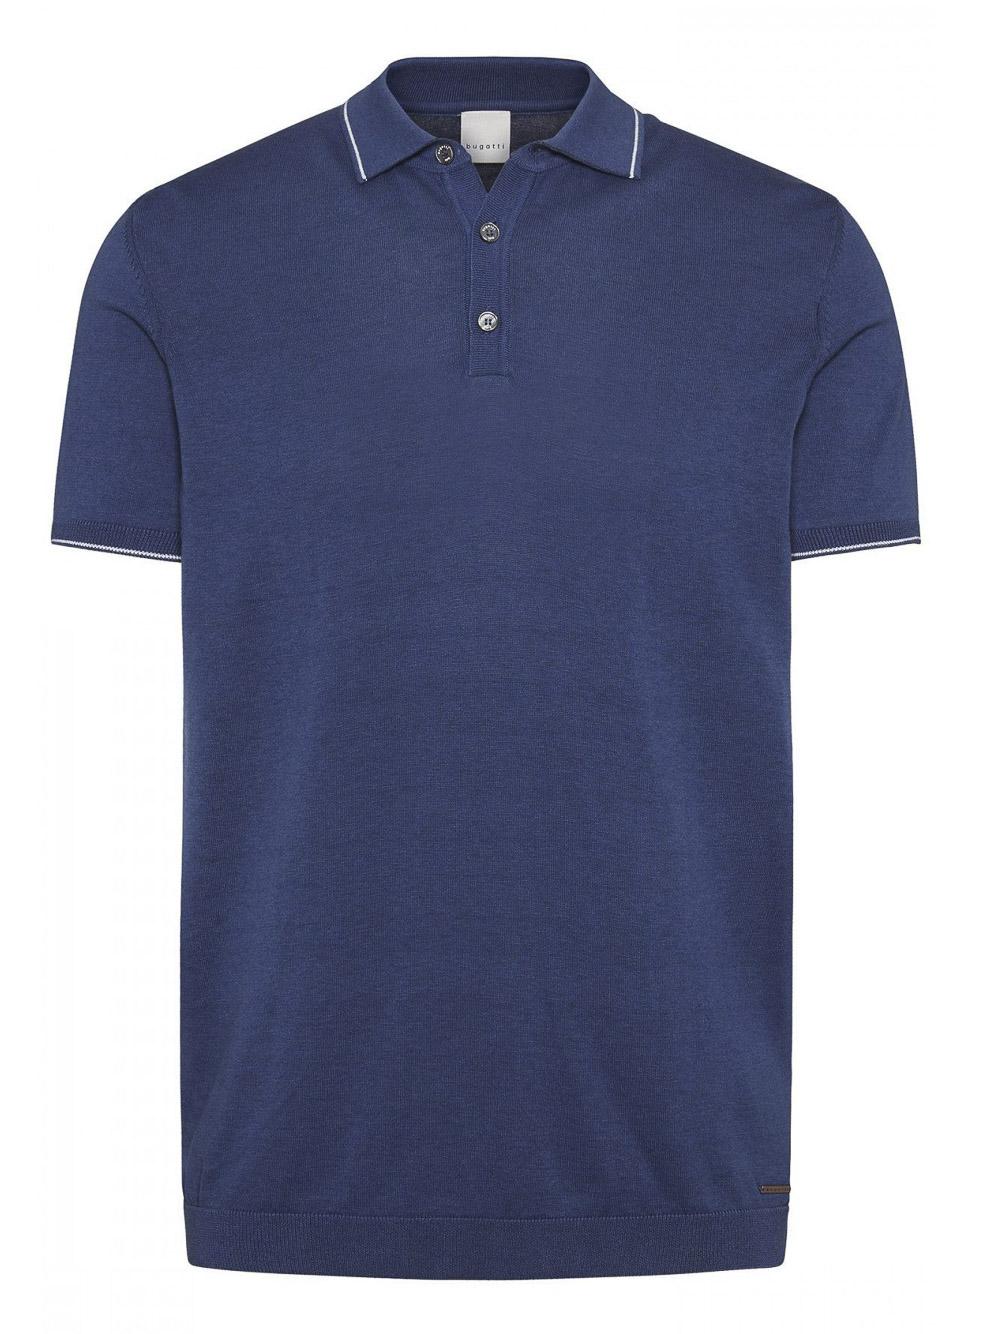 BUGATTI Μπλούζα Polo 7100 55515-370 ΡΑΦ